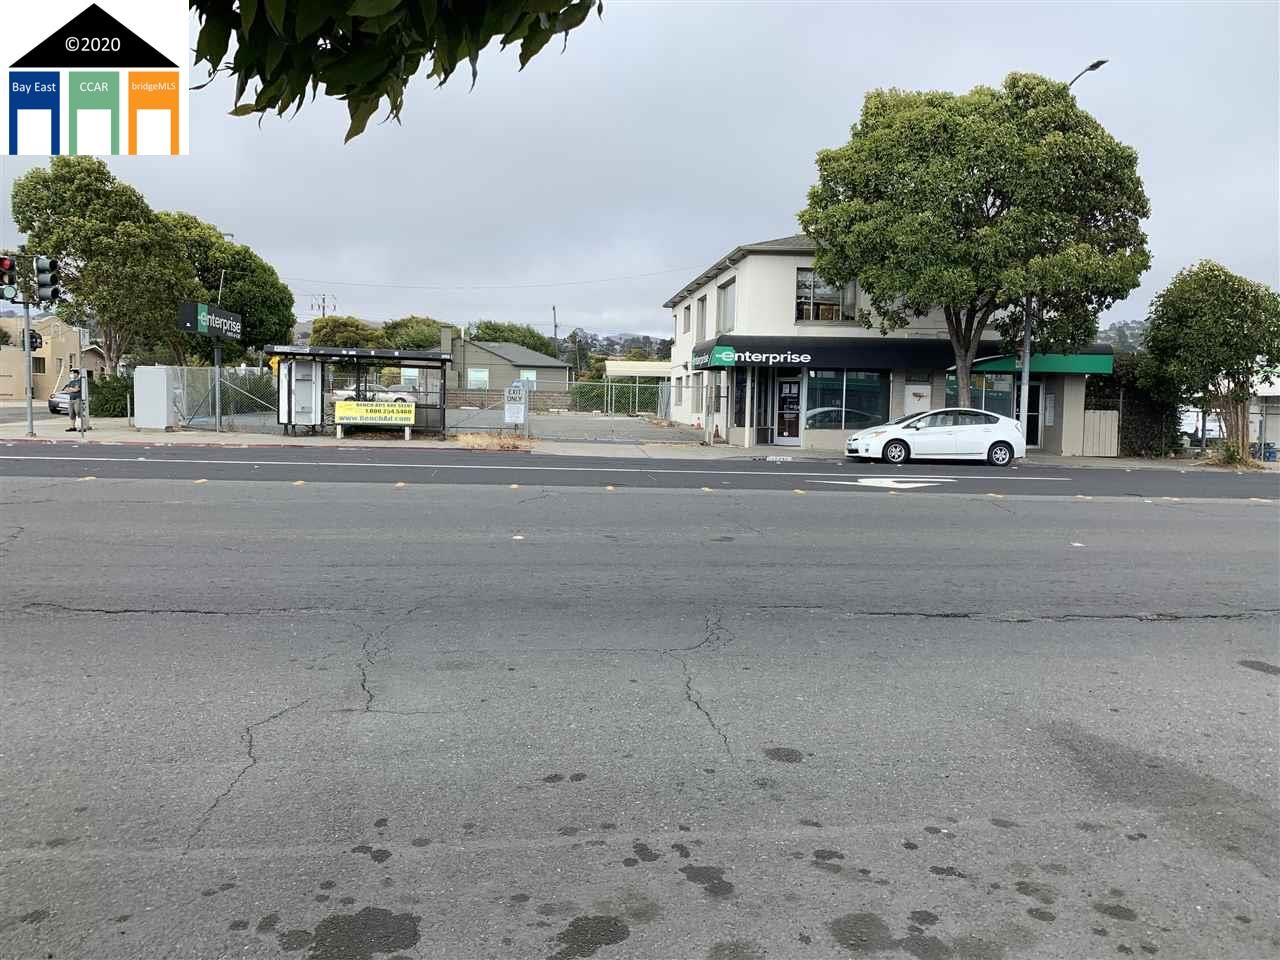 Photo of 12488 San Pablo Ave, RICHMOND, CA 94805 (MLS # 40915313)